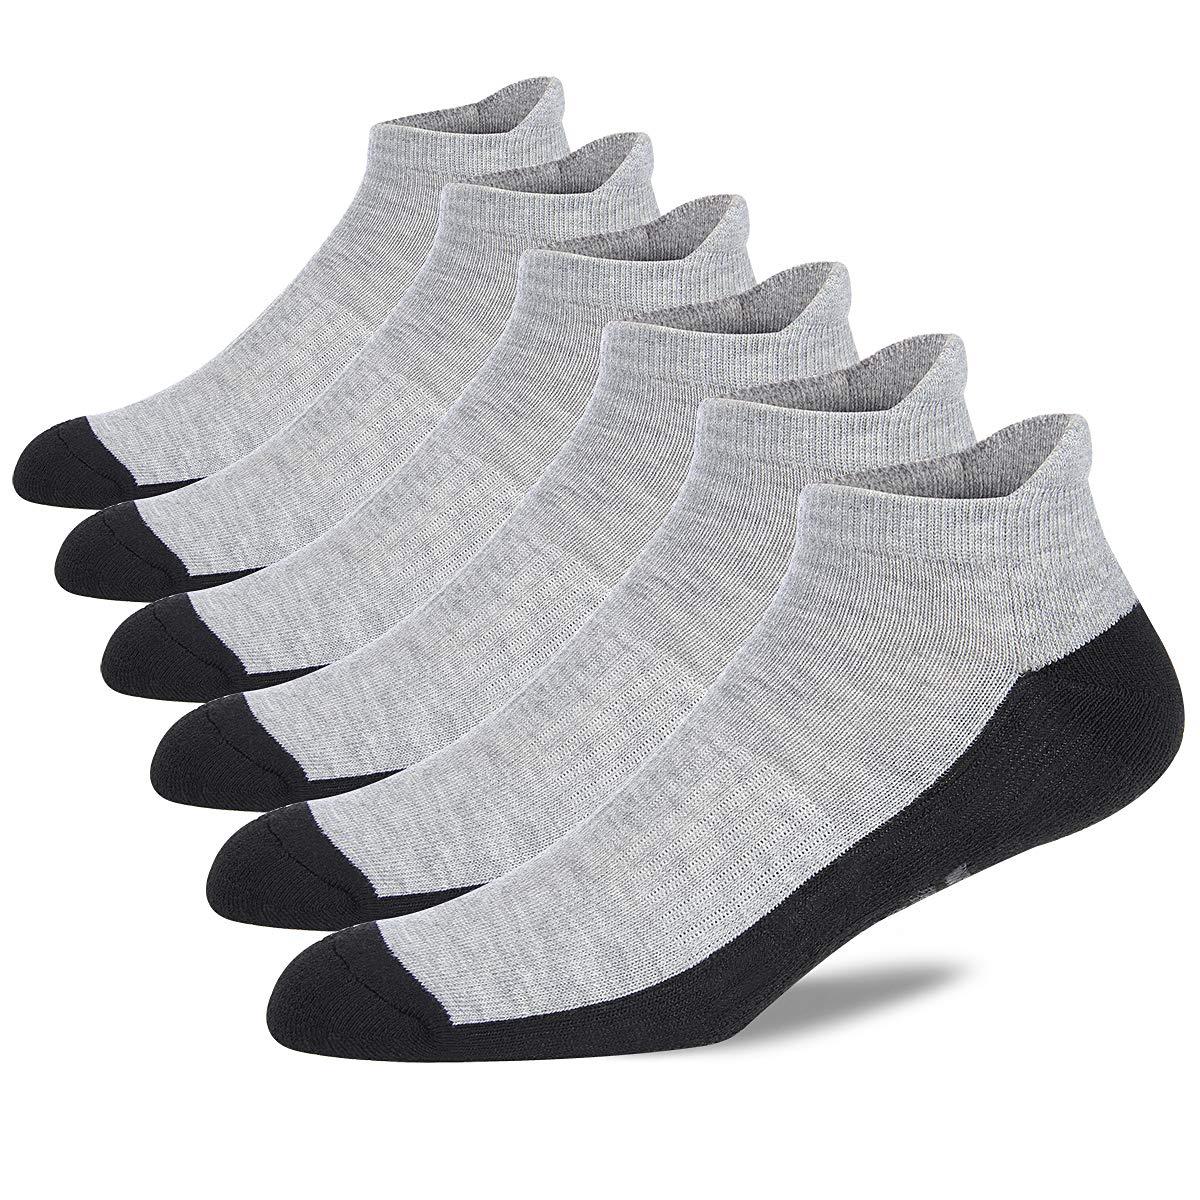 Eallco Mens Ankle Socks Low Cut Athletic Cushioned Running Tab Socks 6 Pack by Eallco